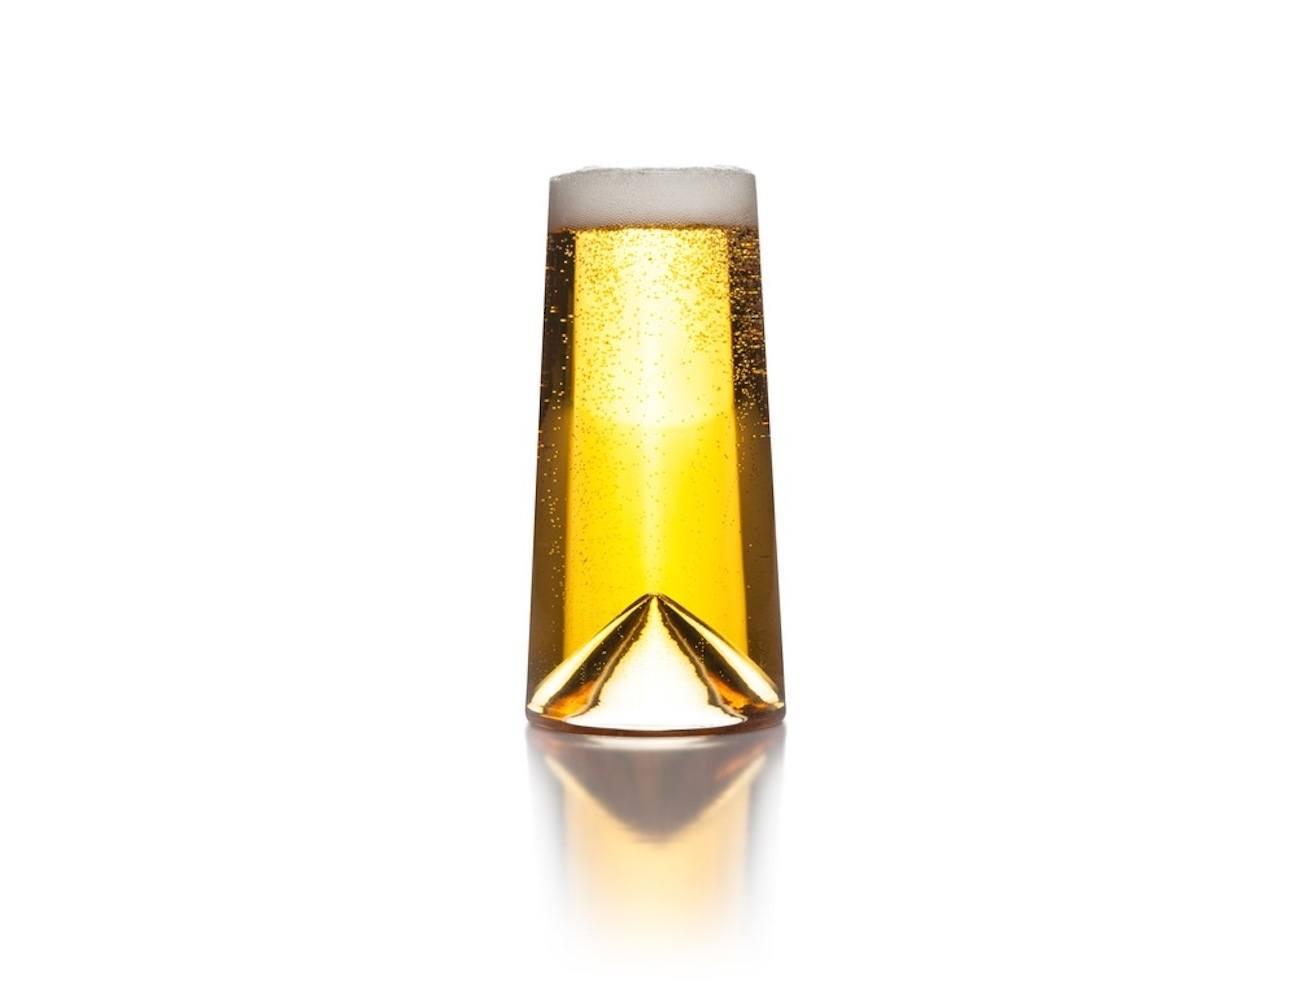 Monti-Pint Beer Enhancing Glass